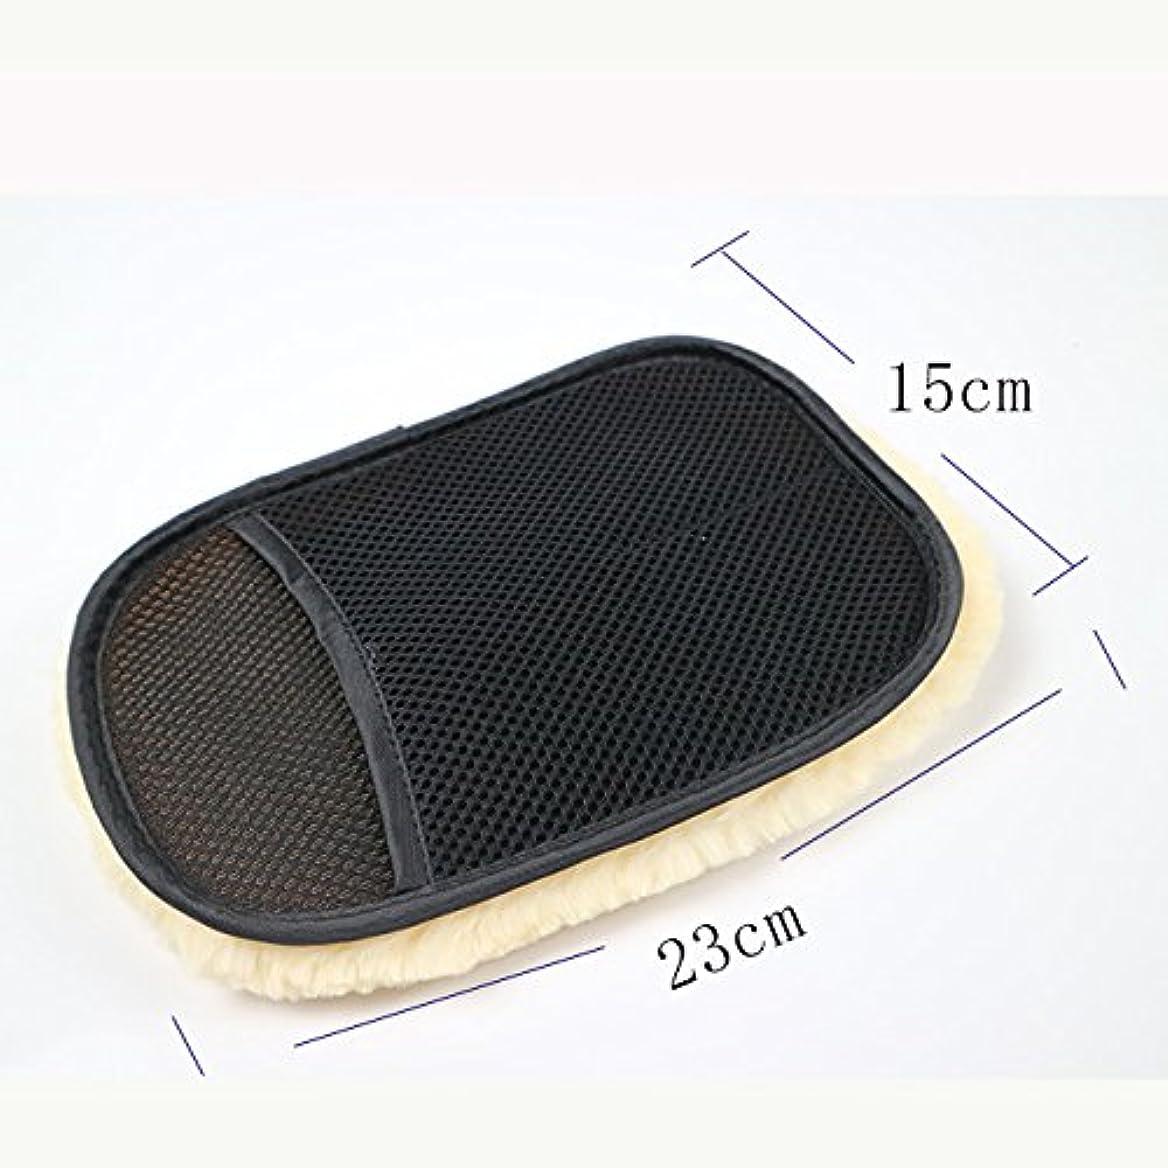 BTXXYJP カースタイリングウール 洗濯手袋 クリーニング ブラシ オートバイ ウォッシャーケア 5ペア (Color : Black, UnitCount : 5 pair)